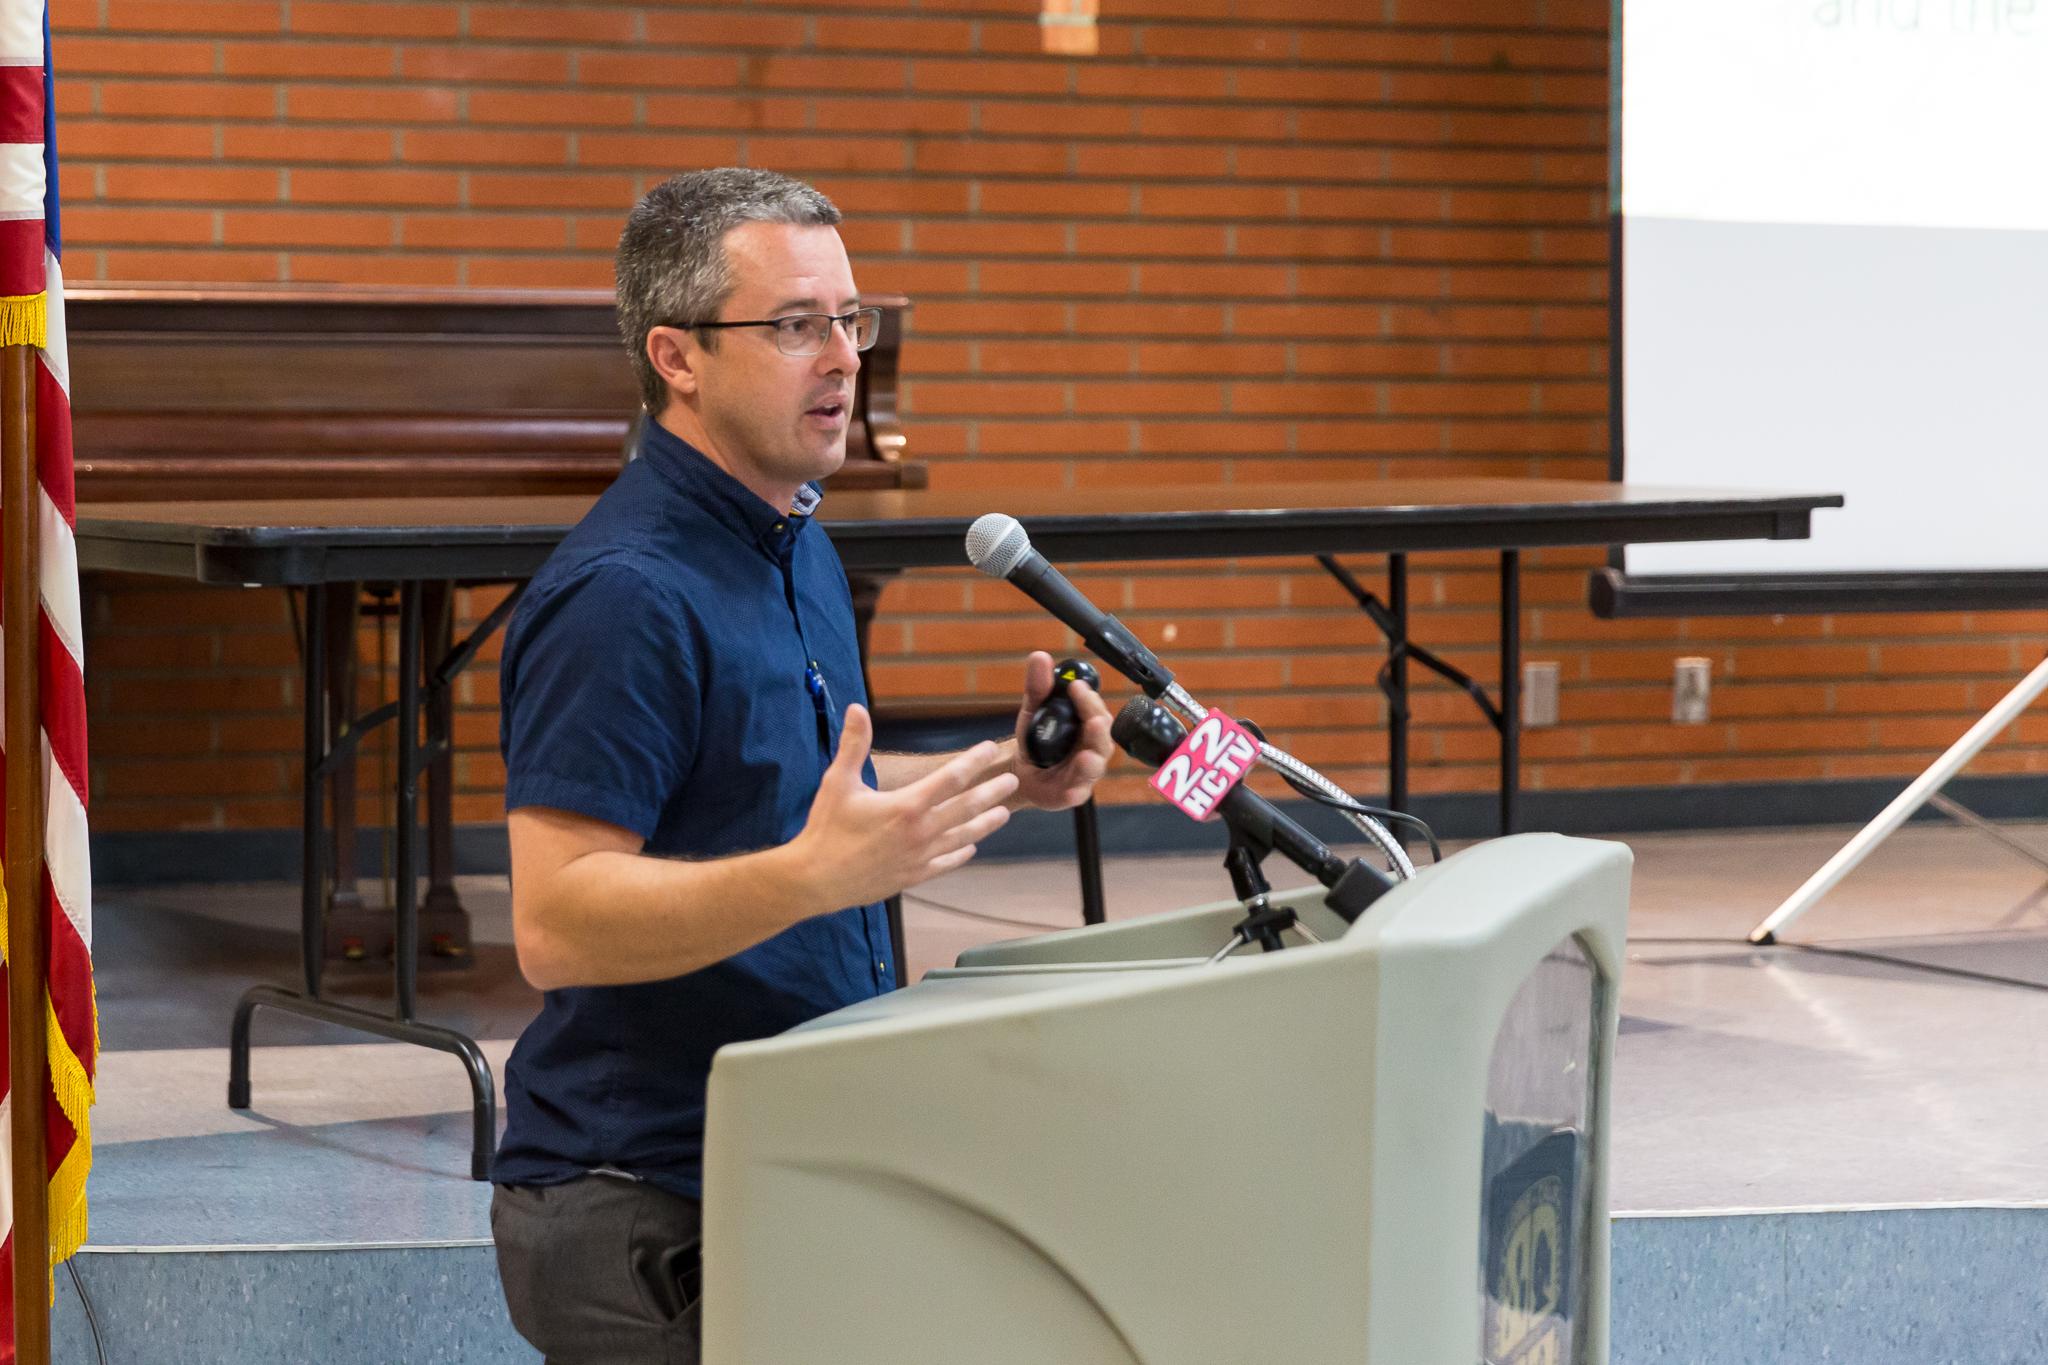 Public Works Environmental Anaylyst Doug Krauss